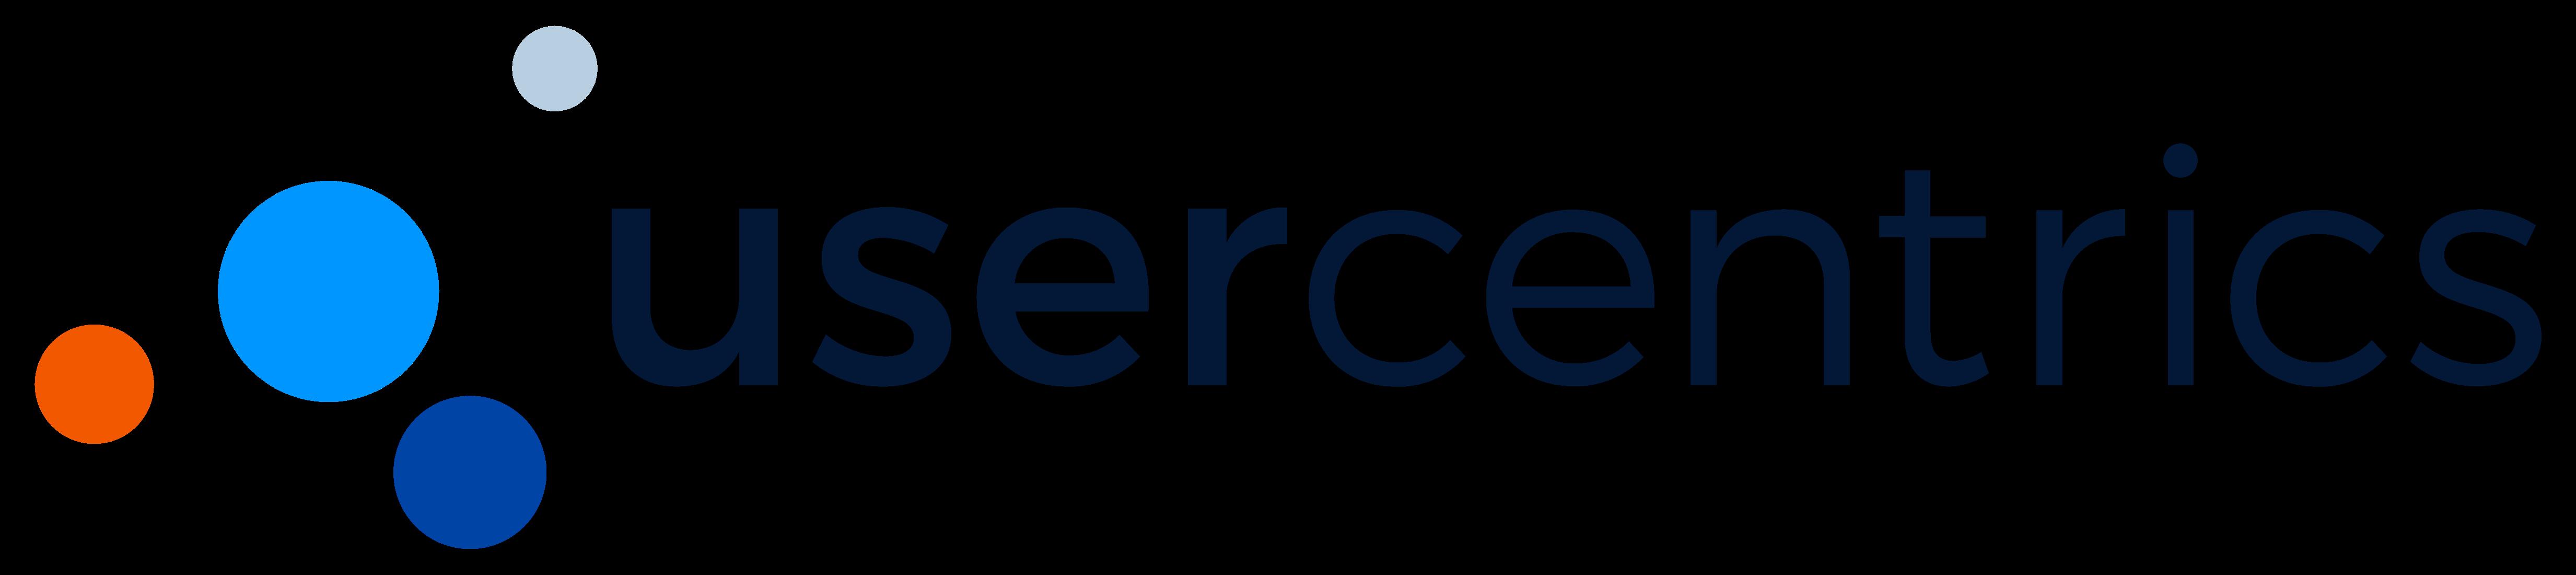 Usercentrics Logo